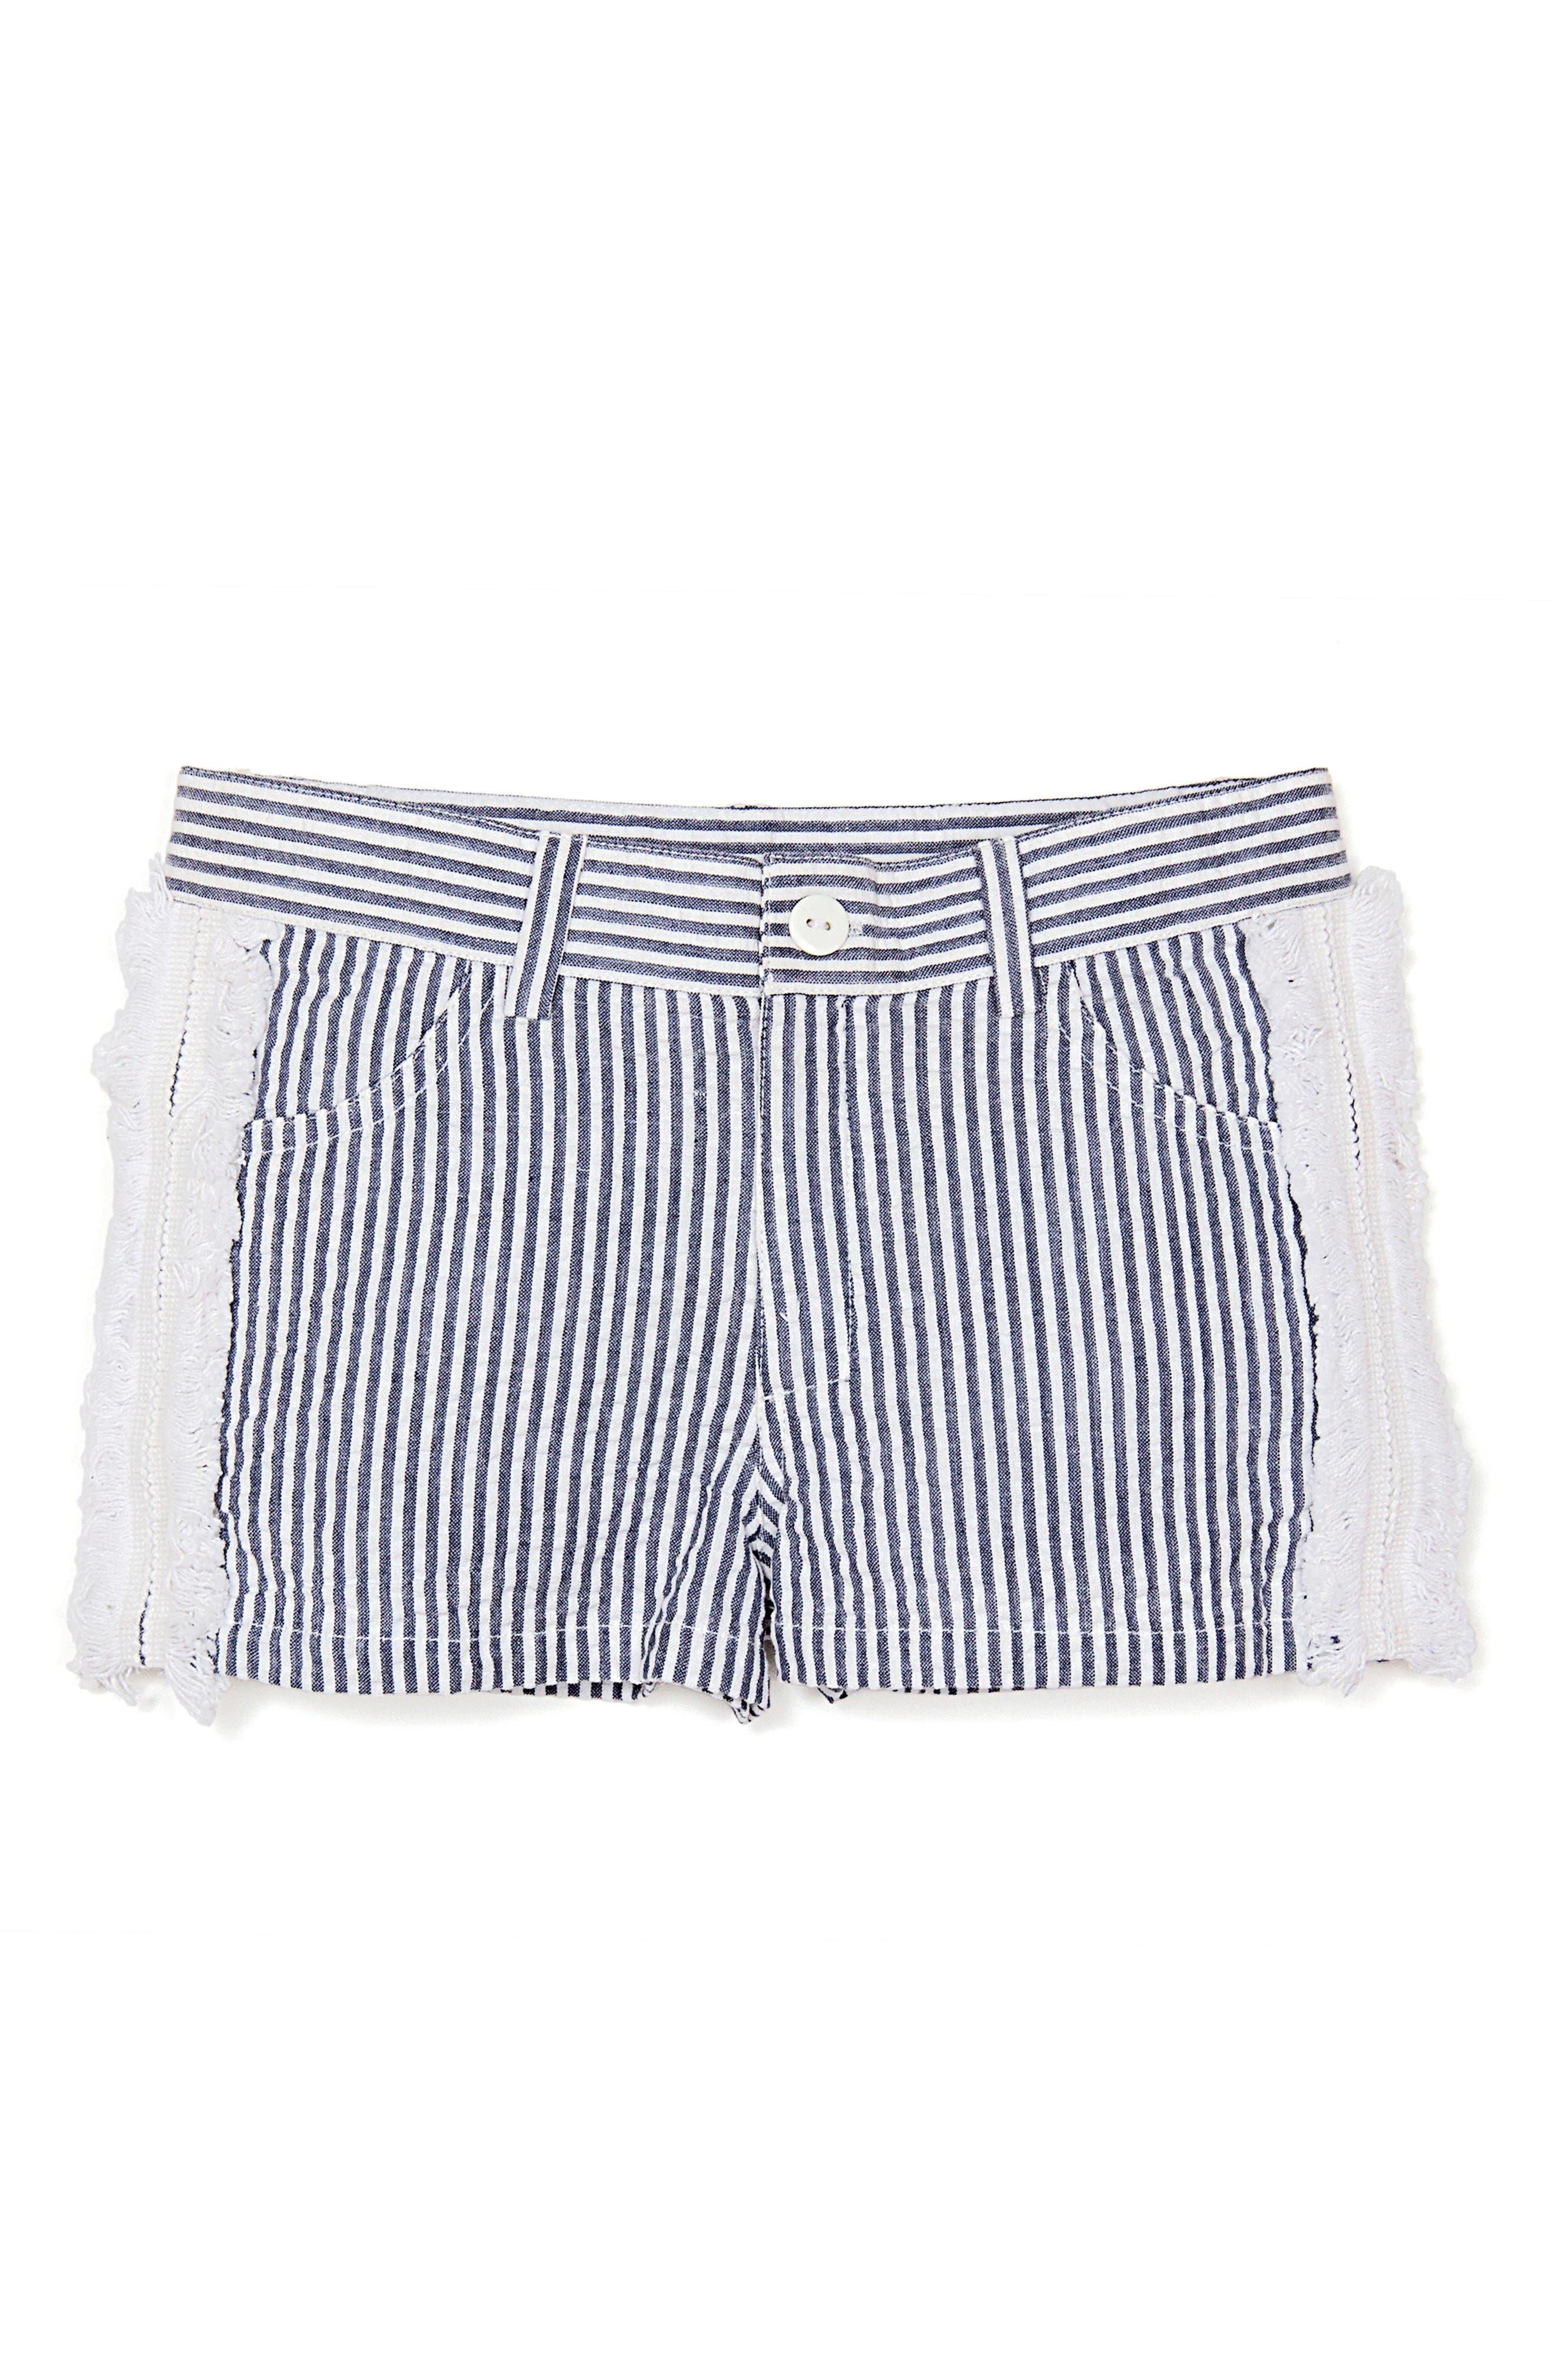 MASALABABY Seersucker Shorts